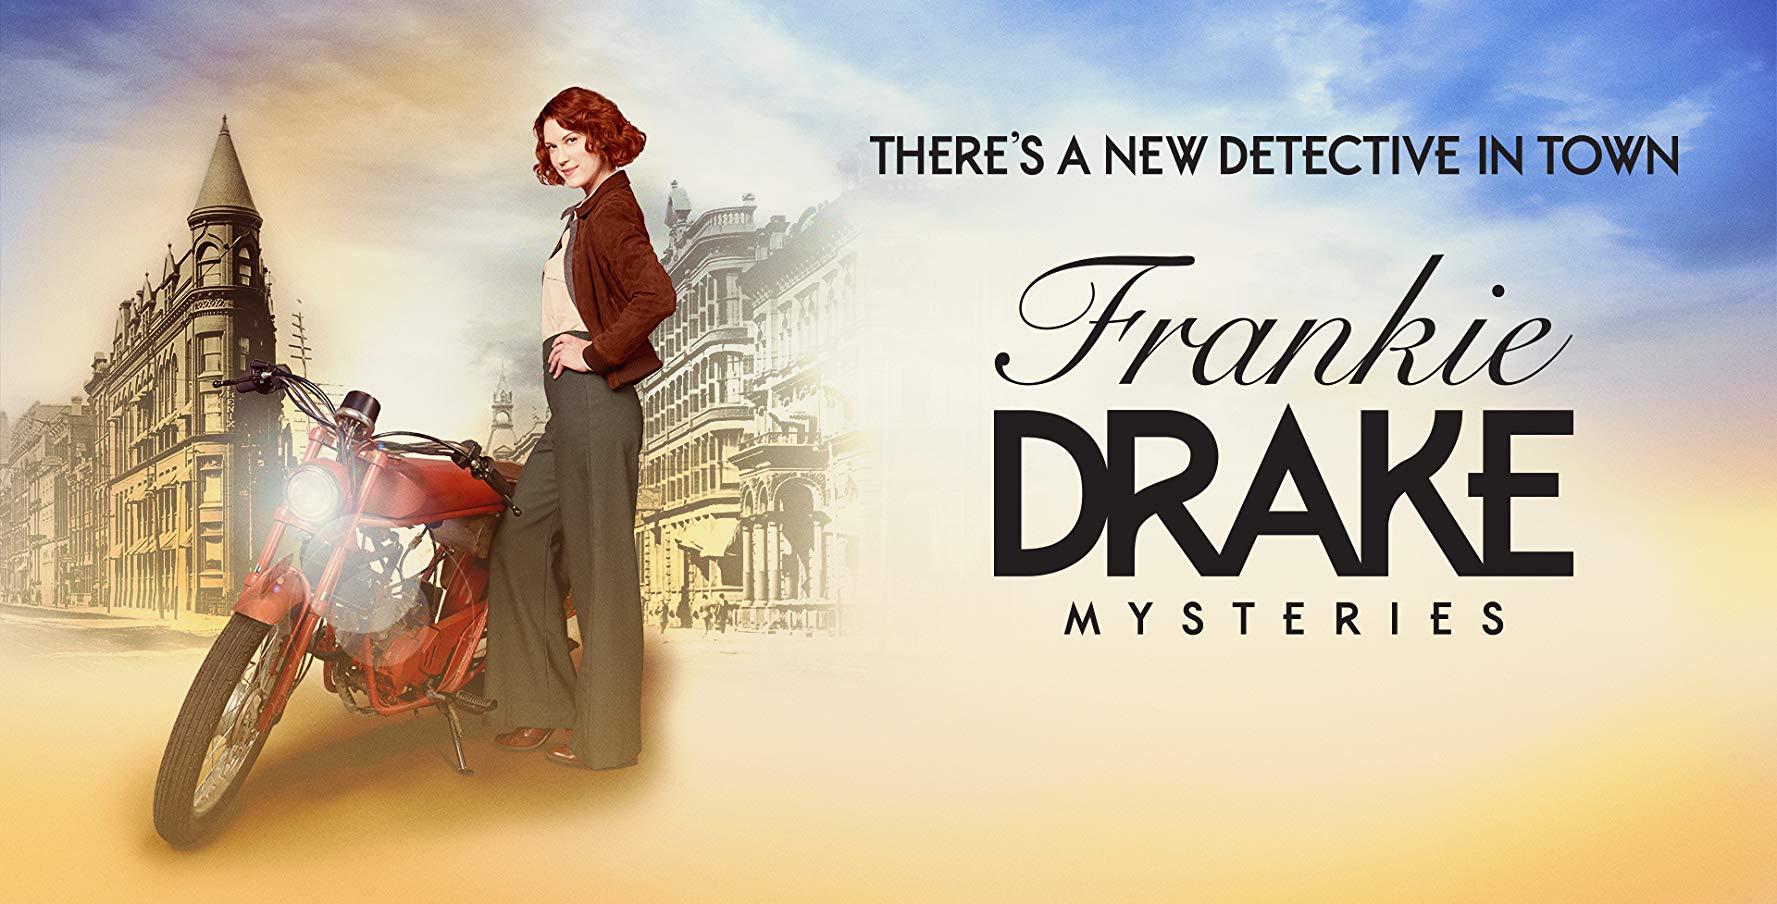 Frankie Drake Mysteries S02E04 720p WEBRip x264-TBS